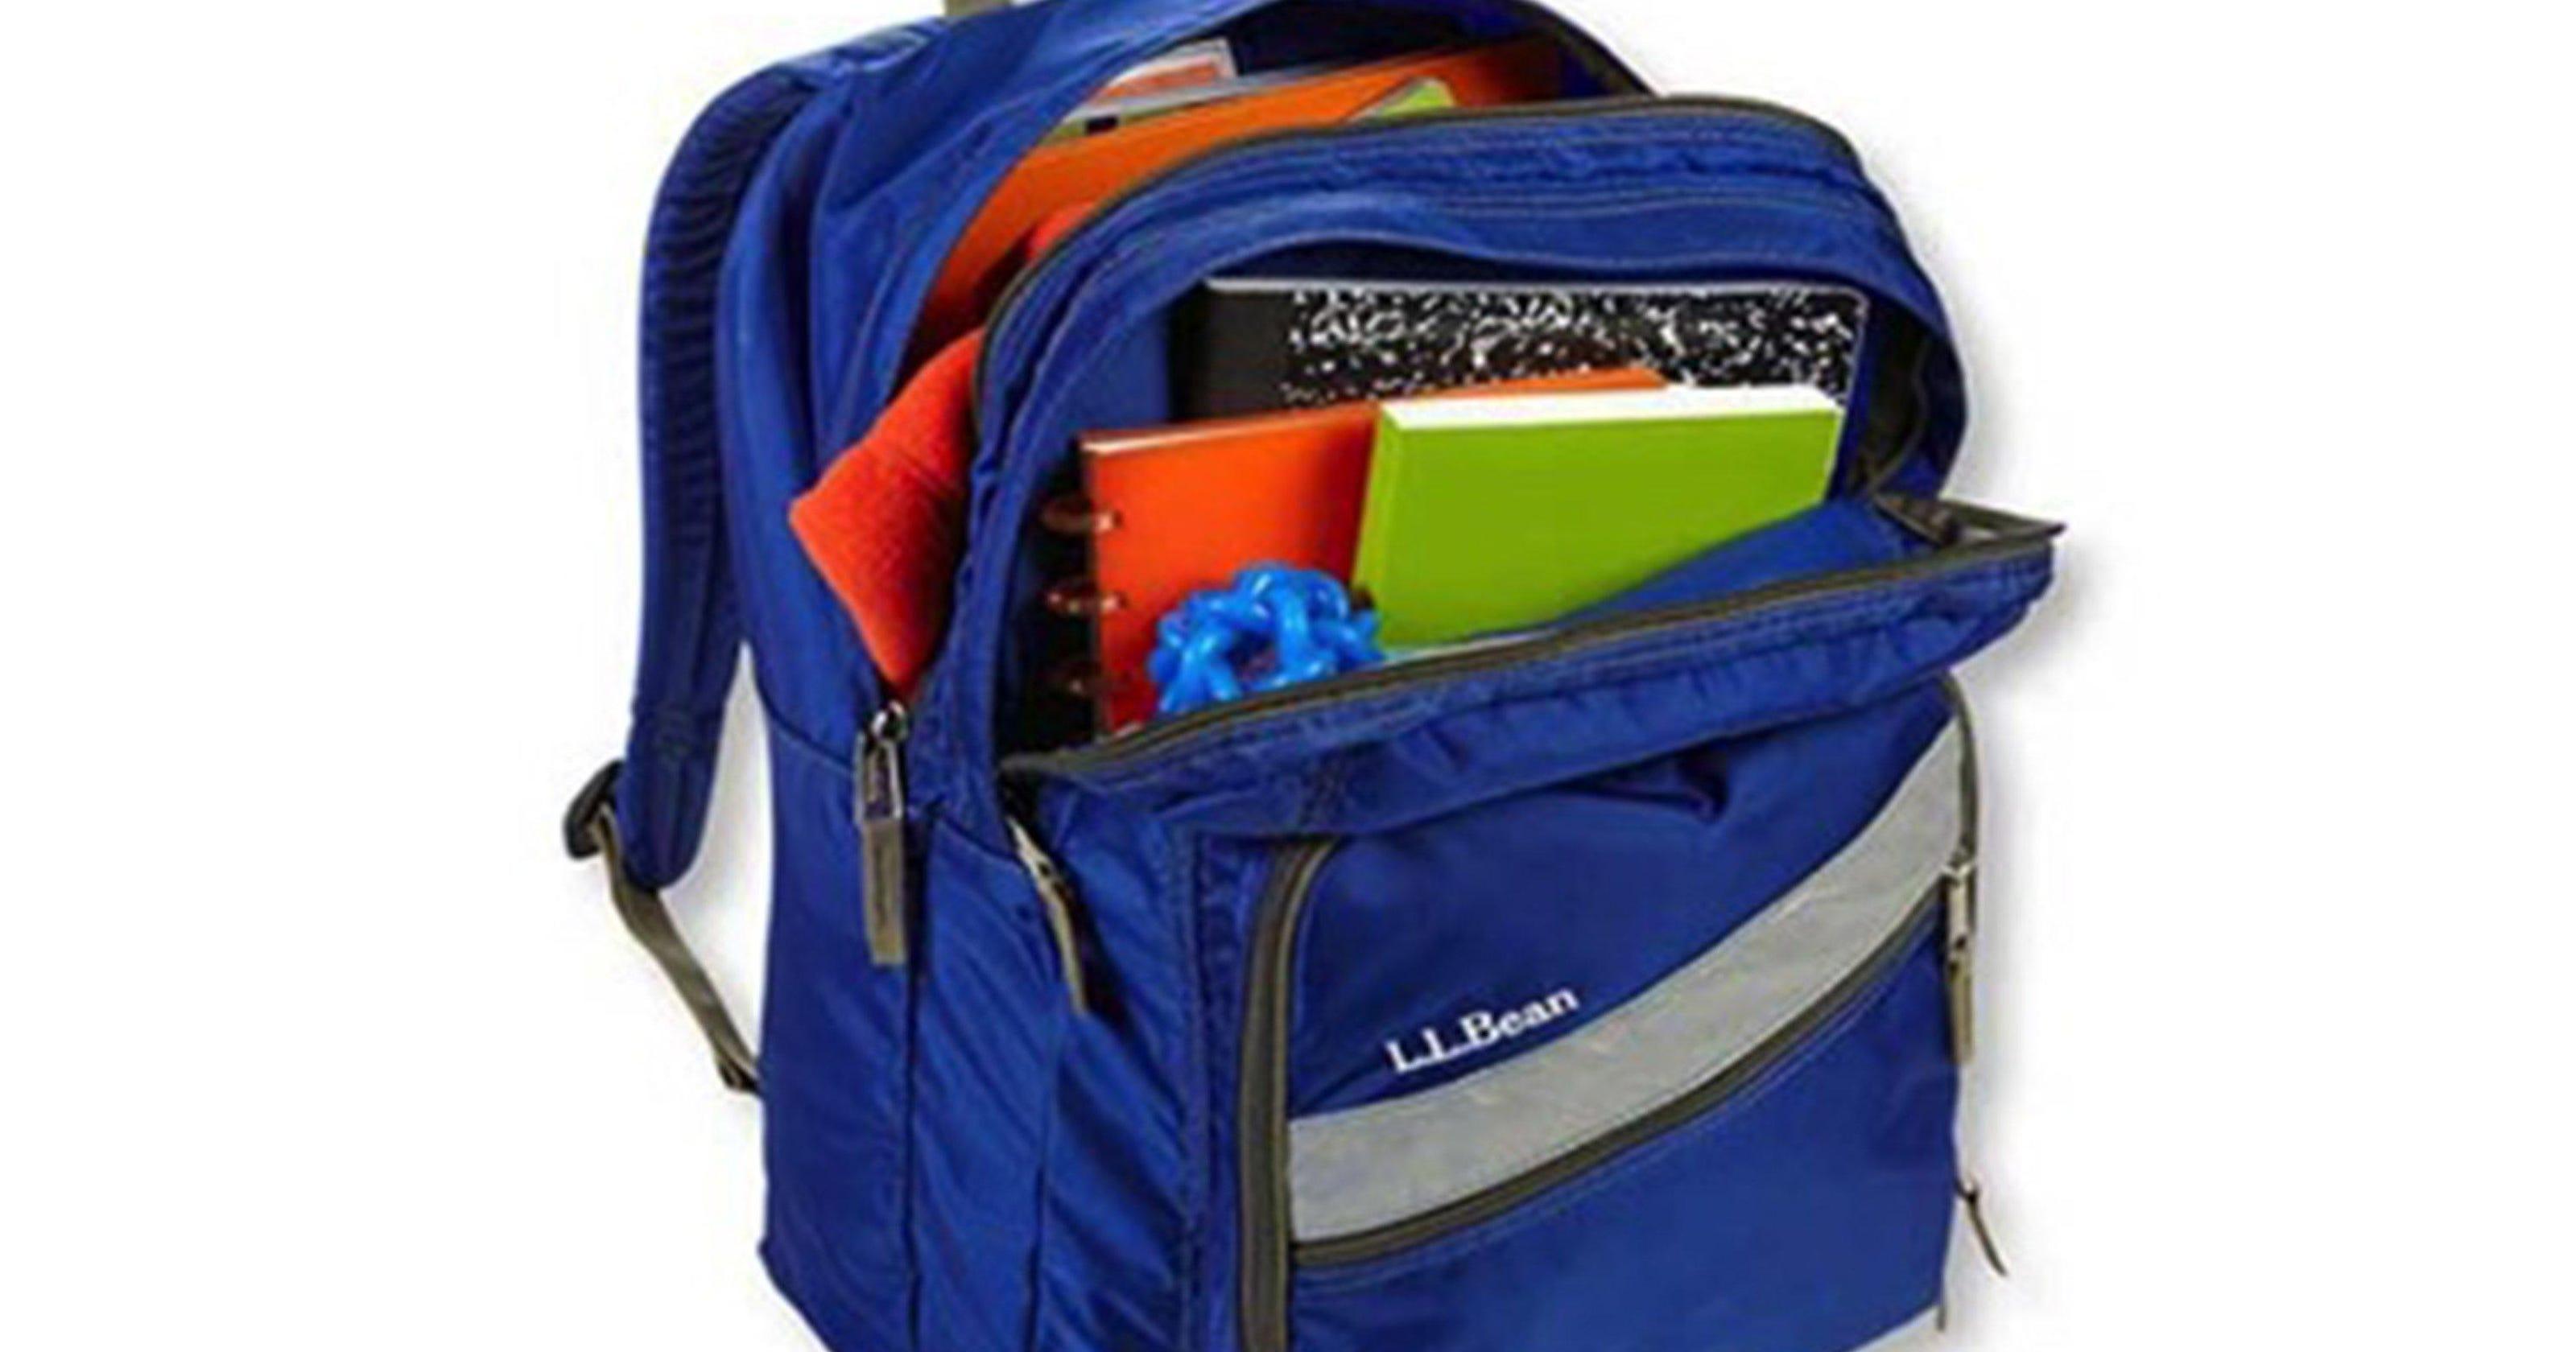 f408056e2f07 Best back-to-school backpacks of 2016